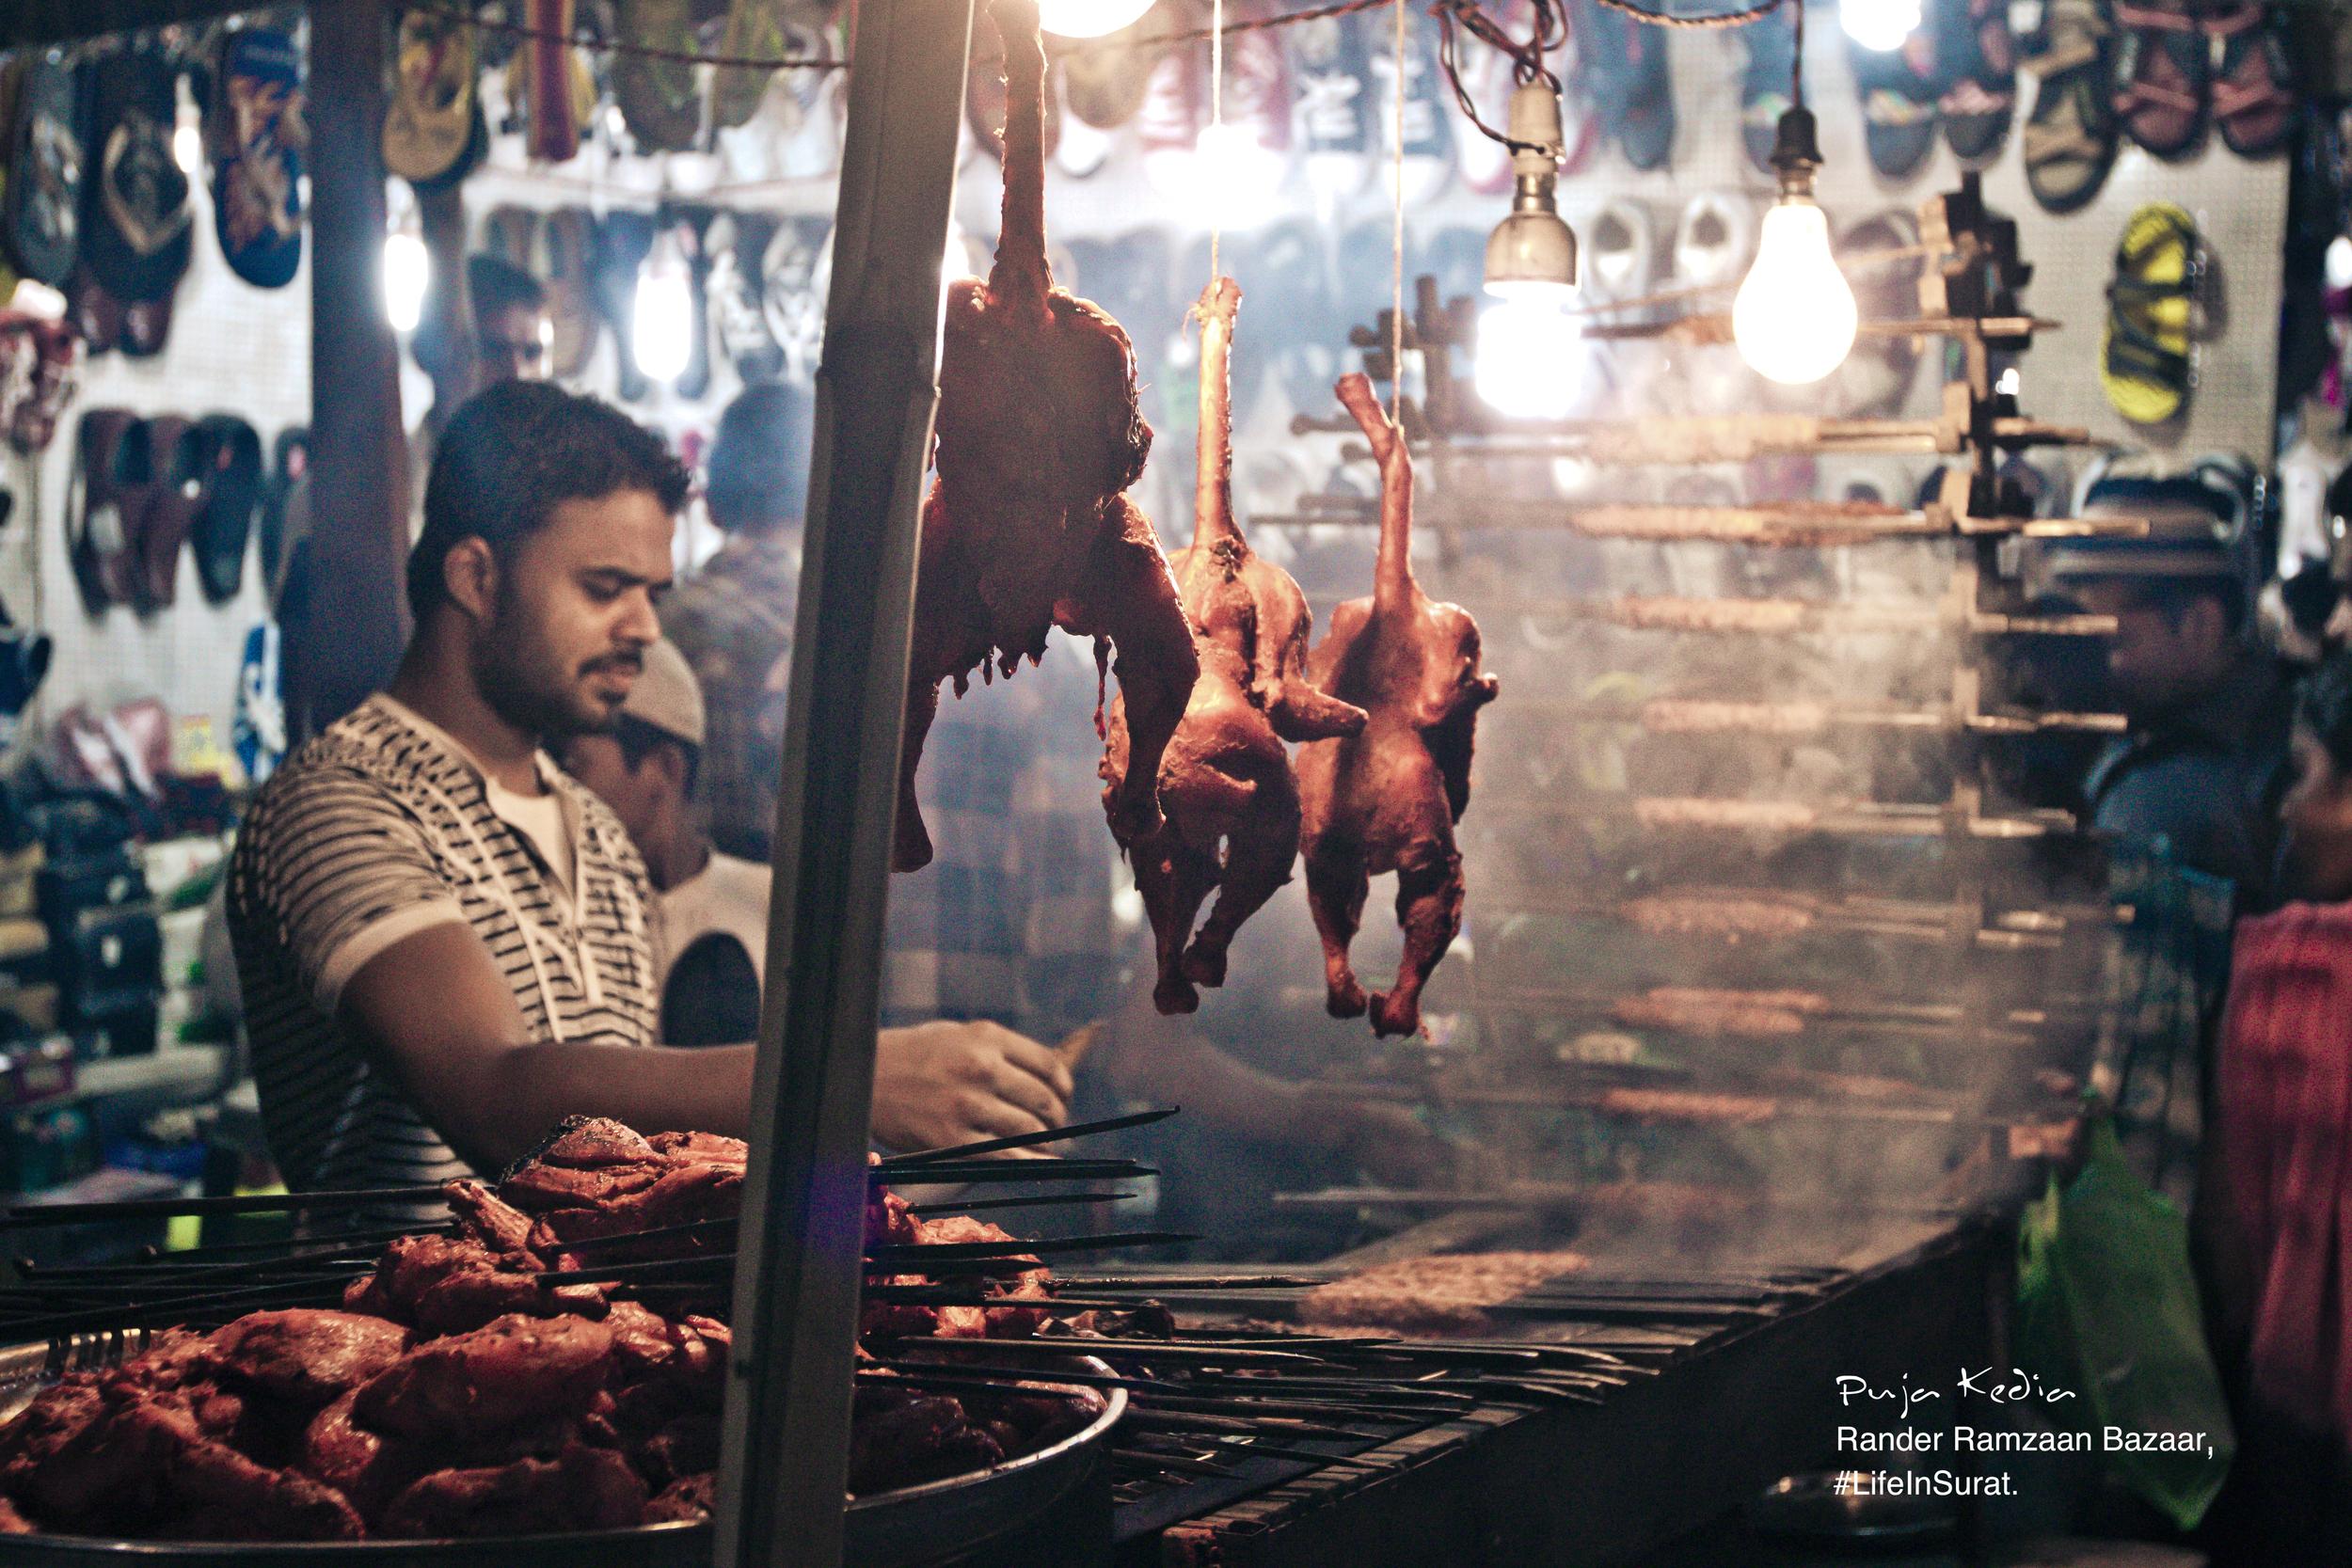 Rander Ramzan Bazaar